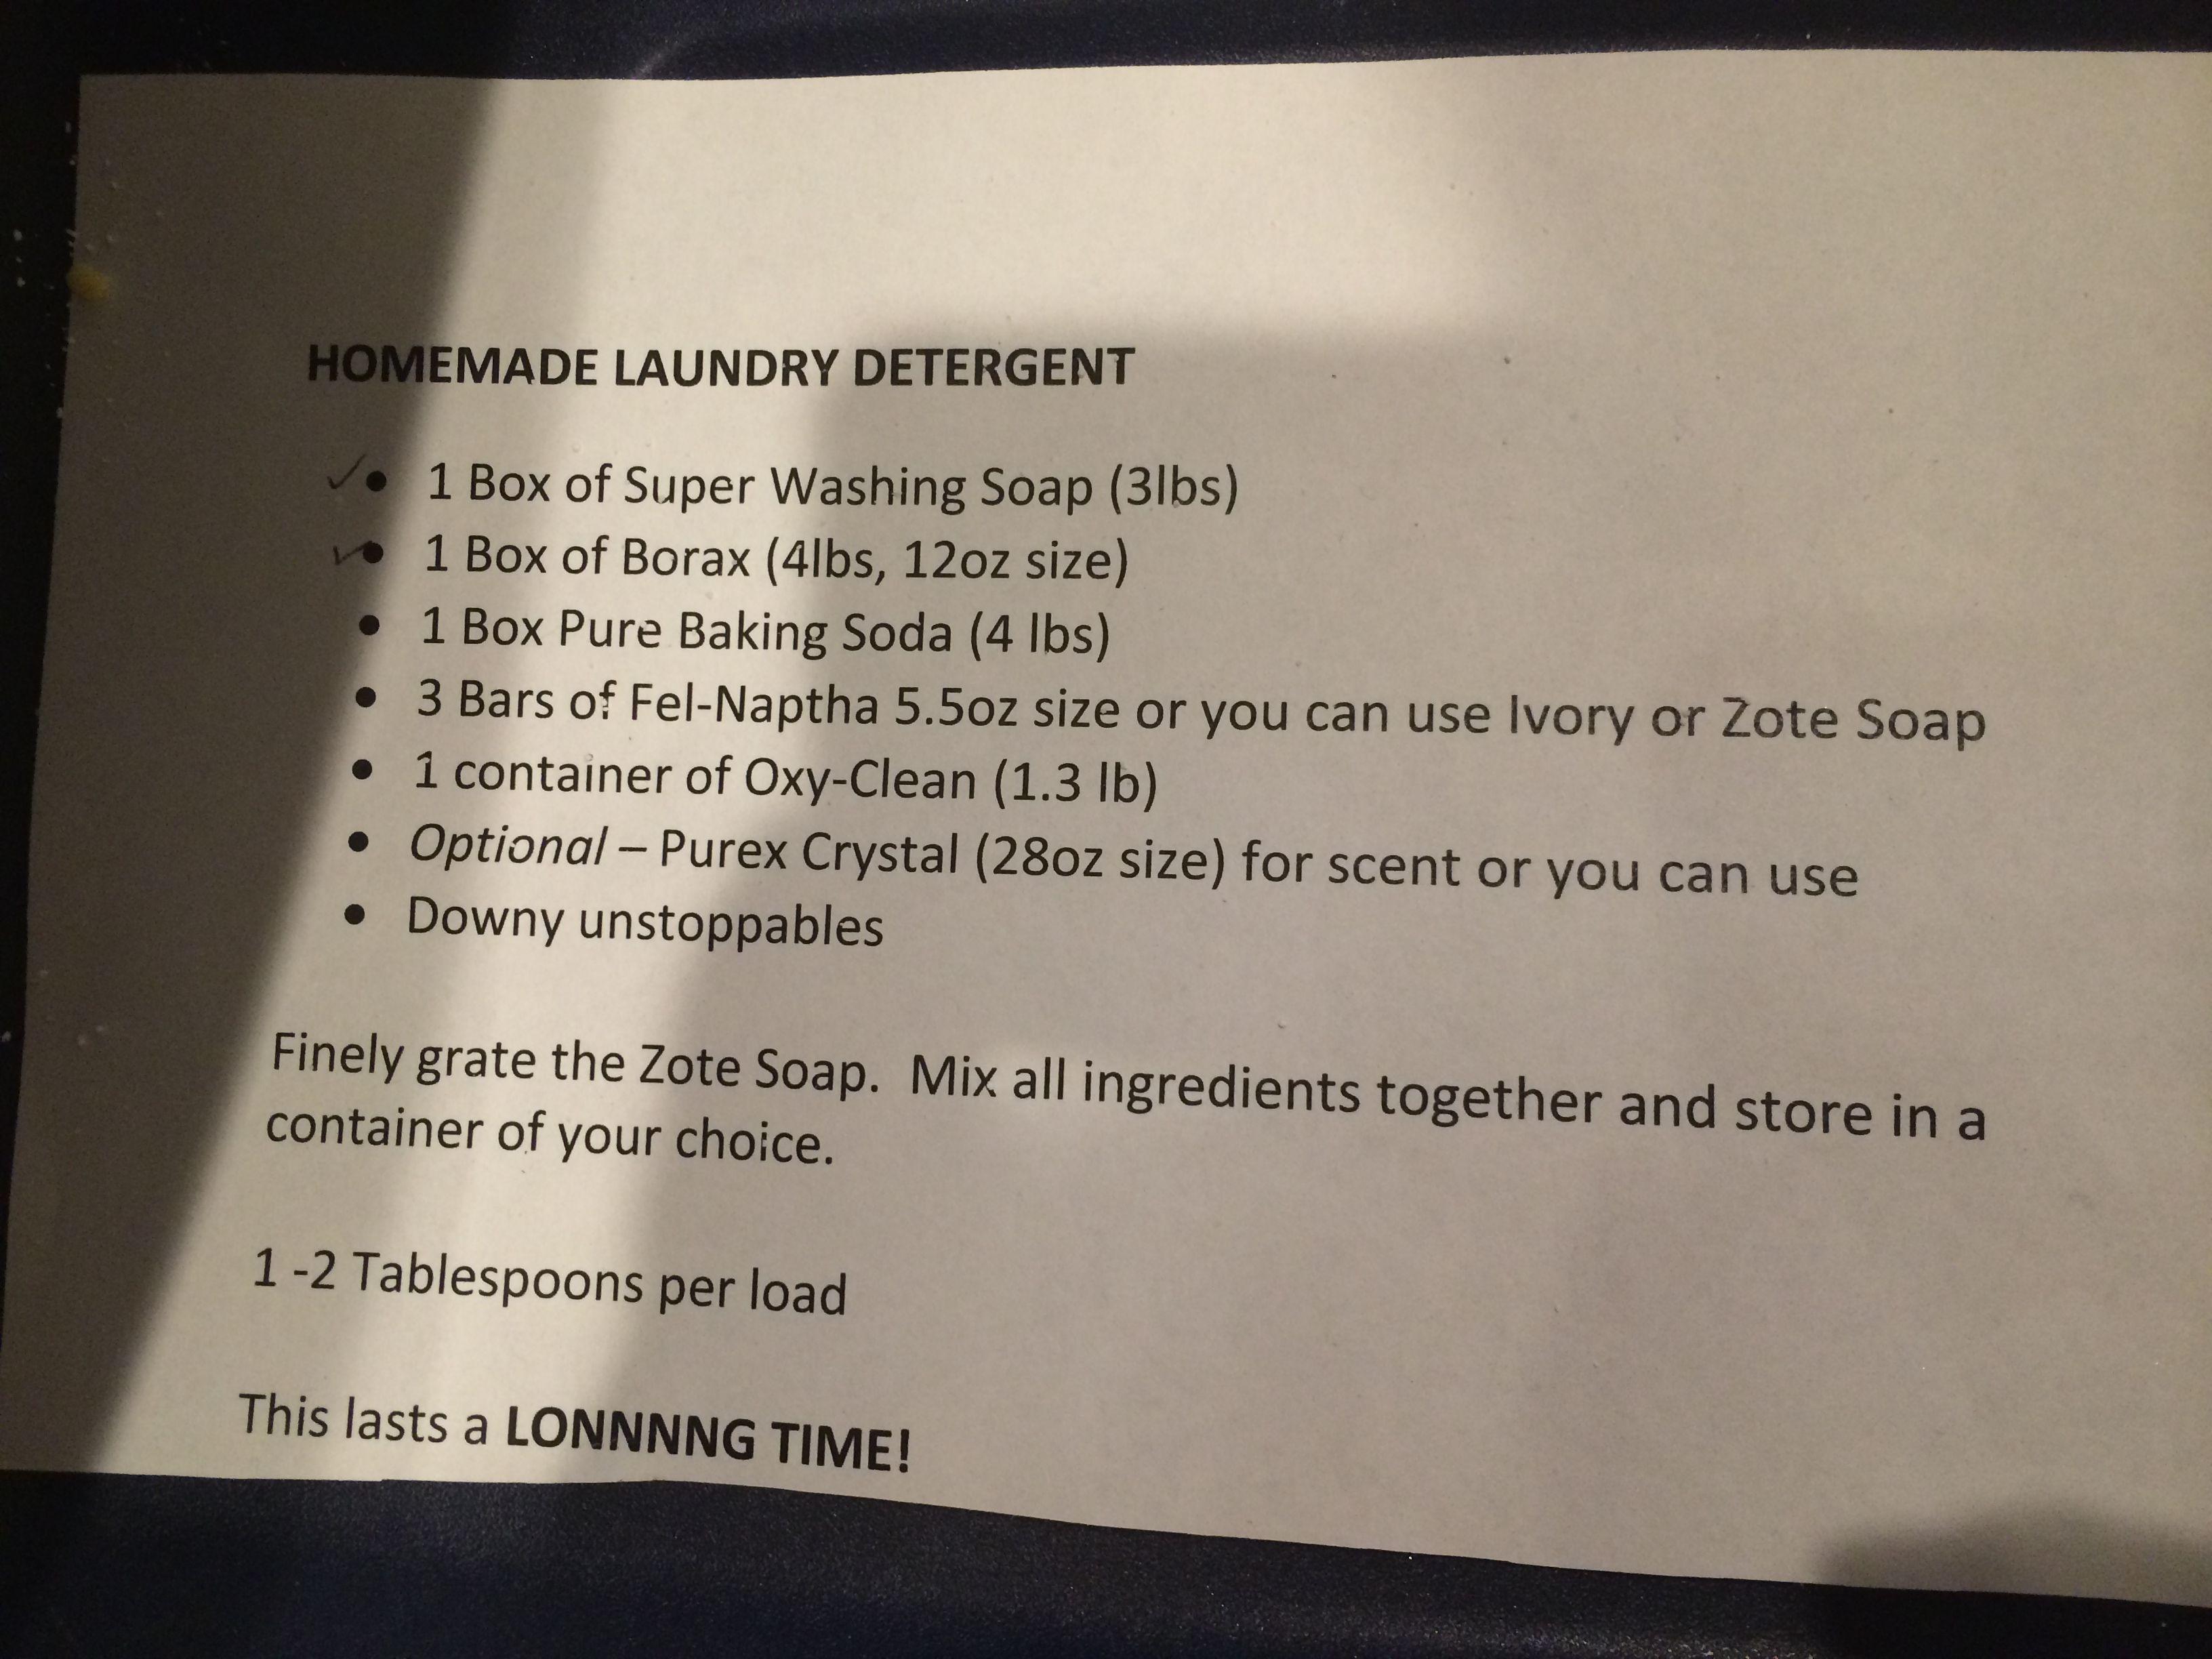 Pin by Amanda Jobe on Home Keeping & Organization